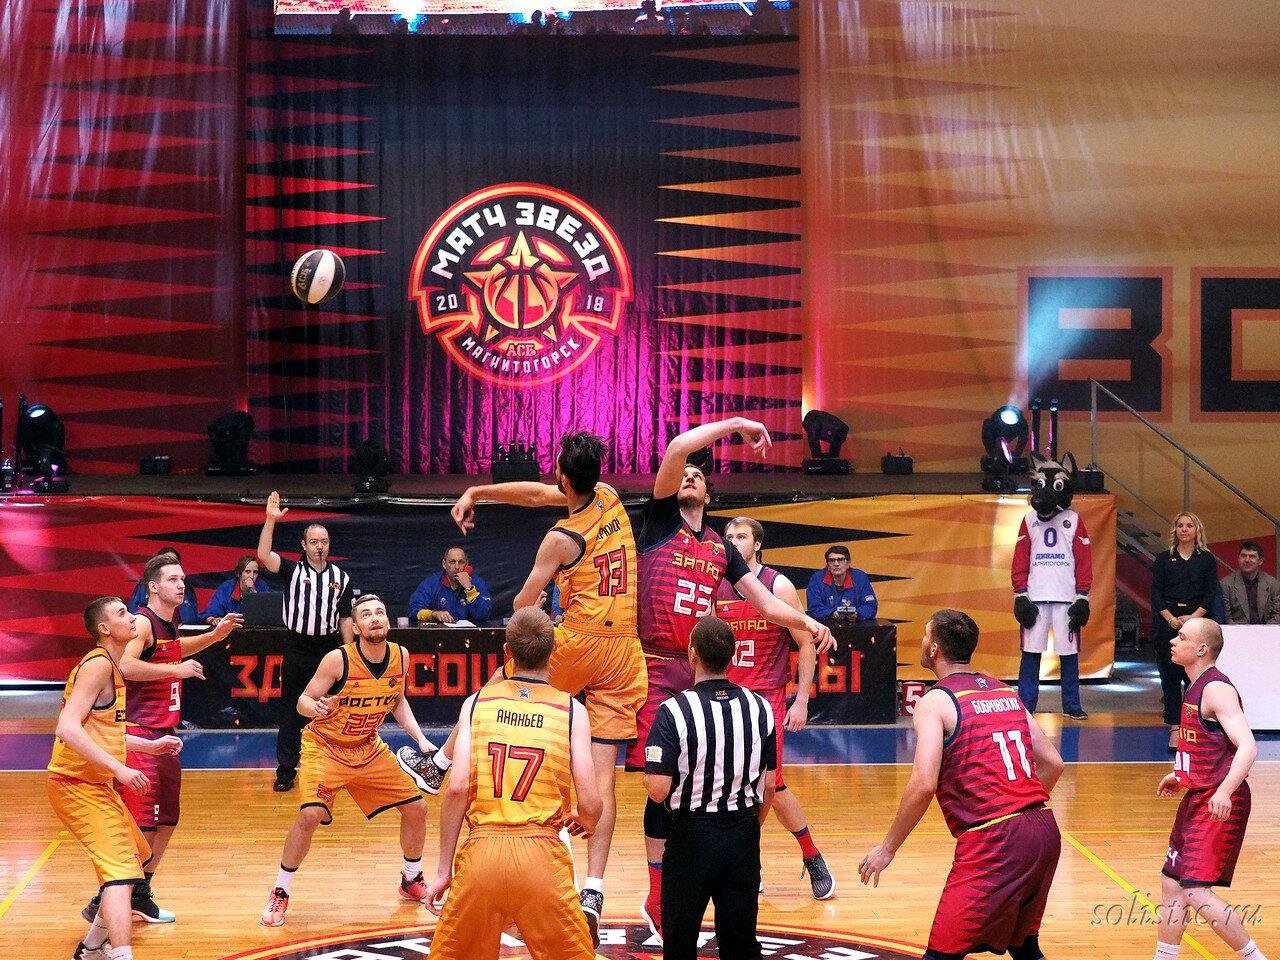 60 Матч звезд АСБ 2018 (ассоциации студенческого баскетбола)